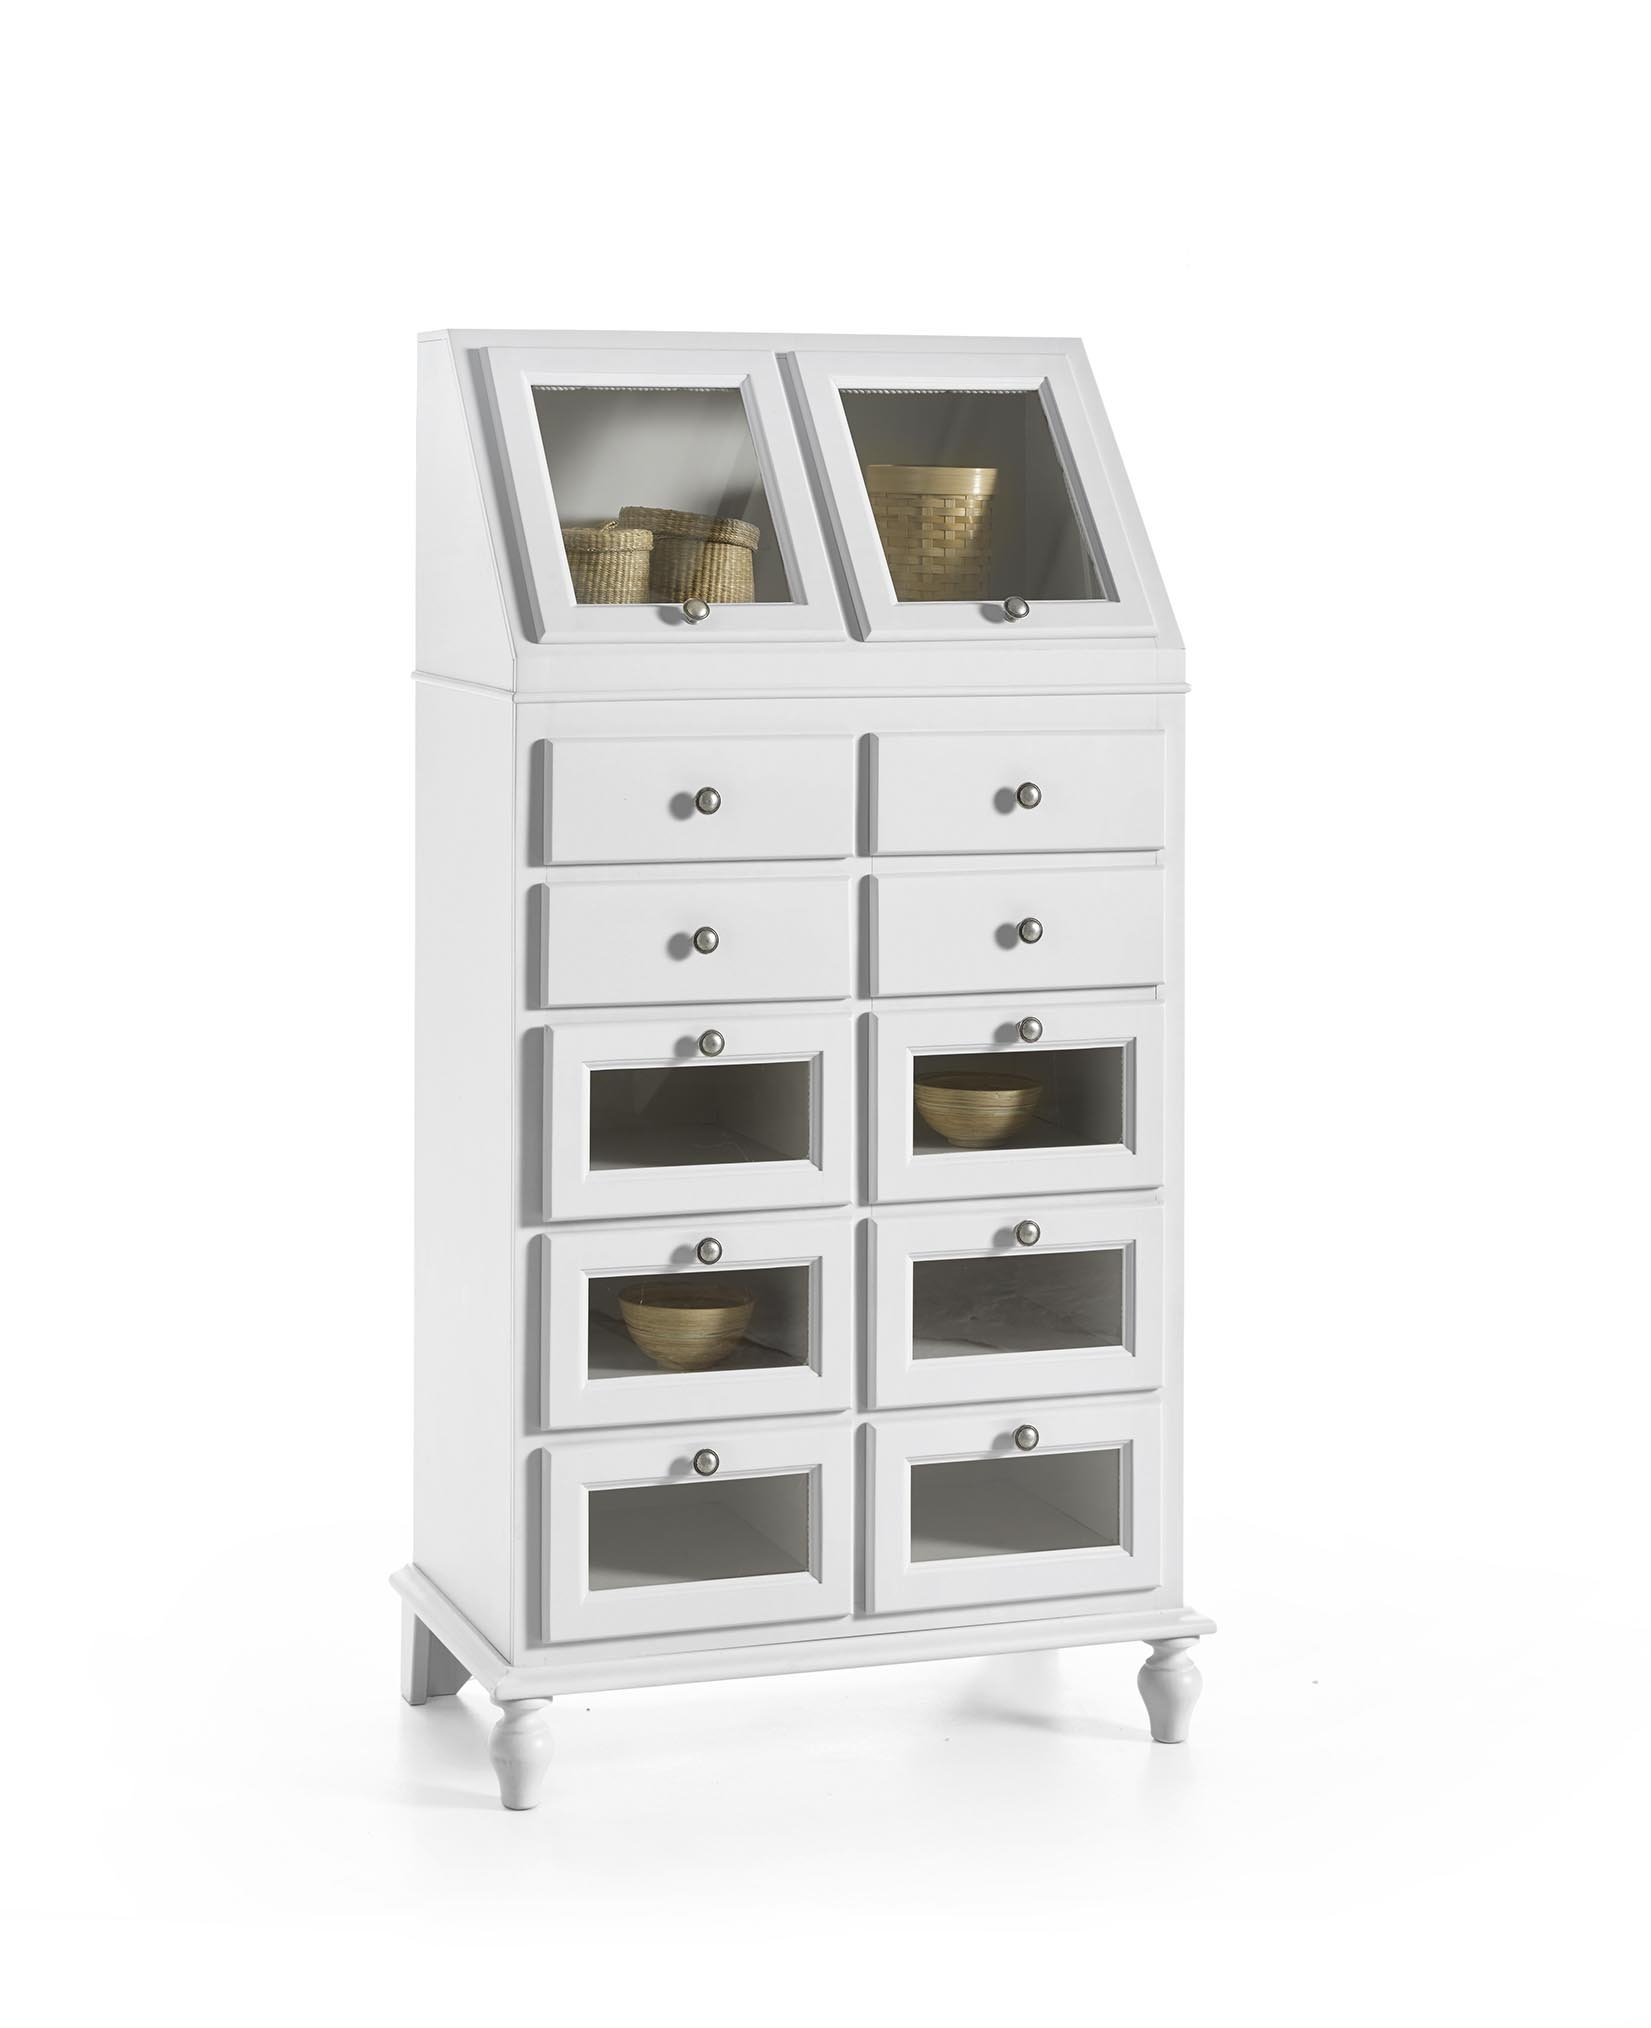 155 Mobili Per Cucina - mobili e accessori per cucine ad ...